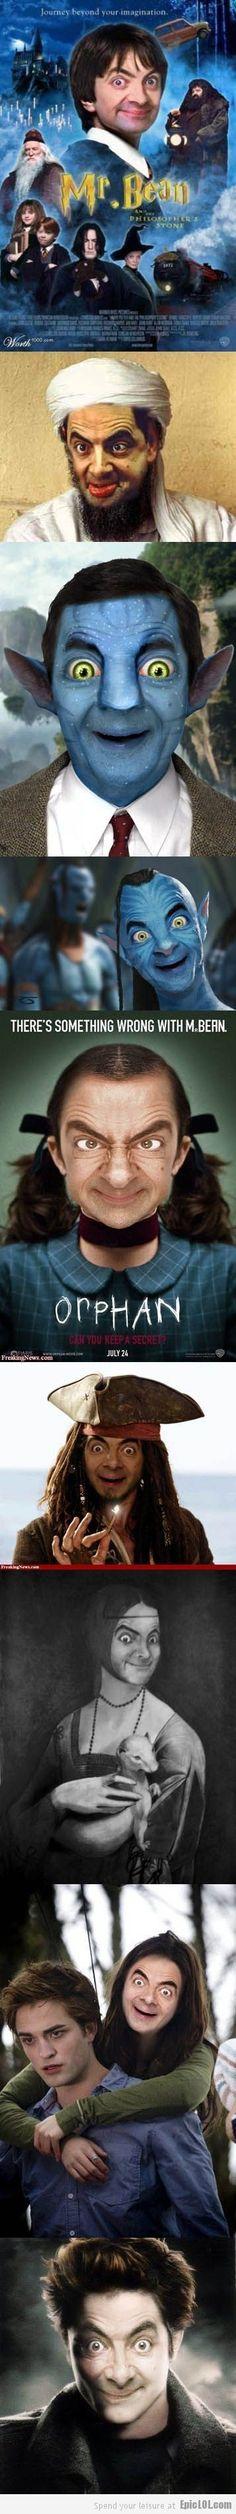 Mr. Bean #funny